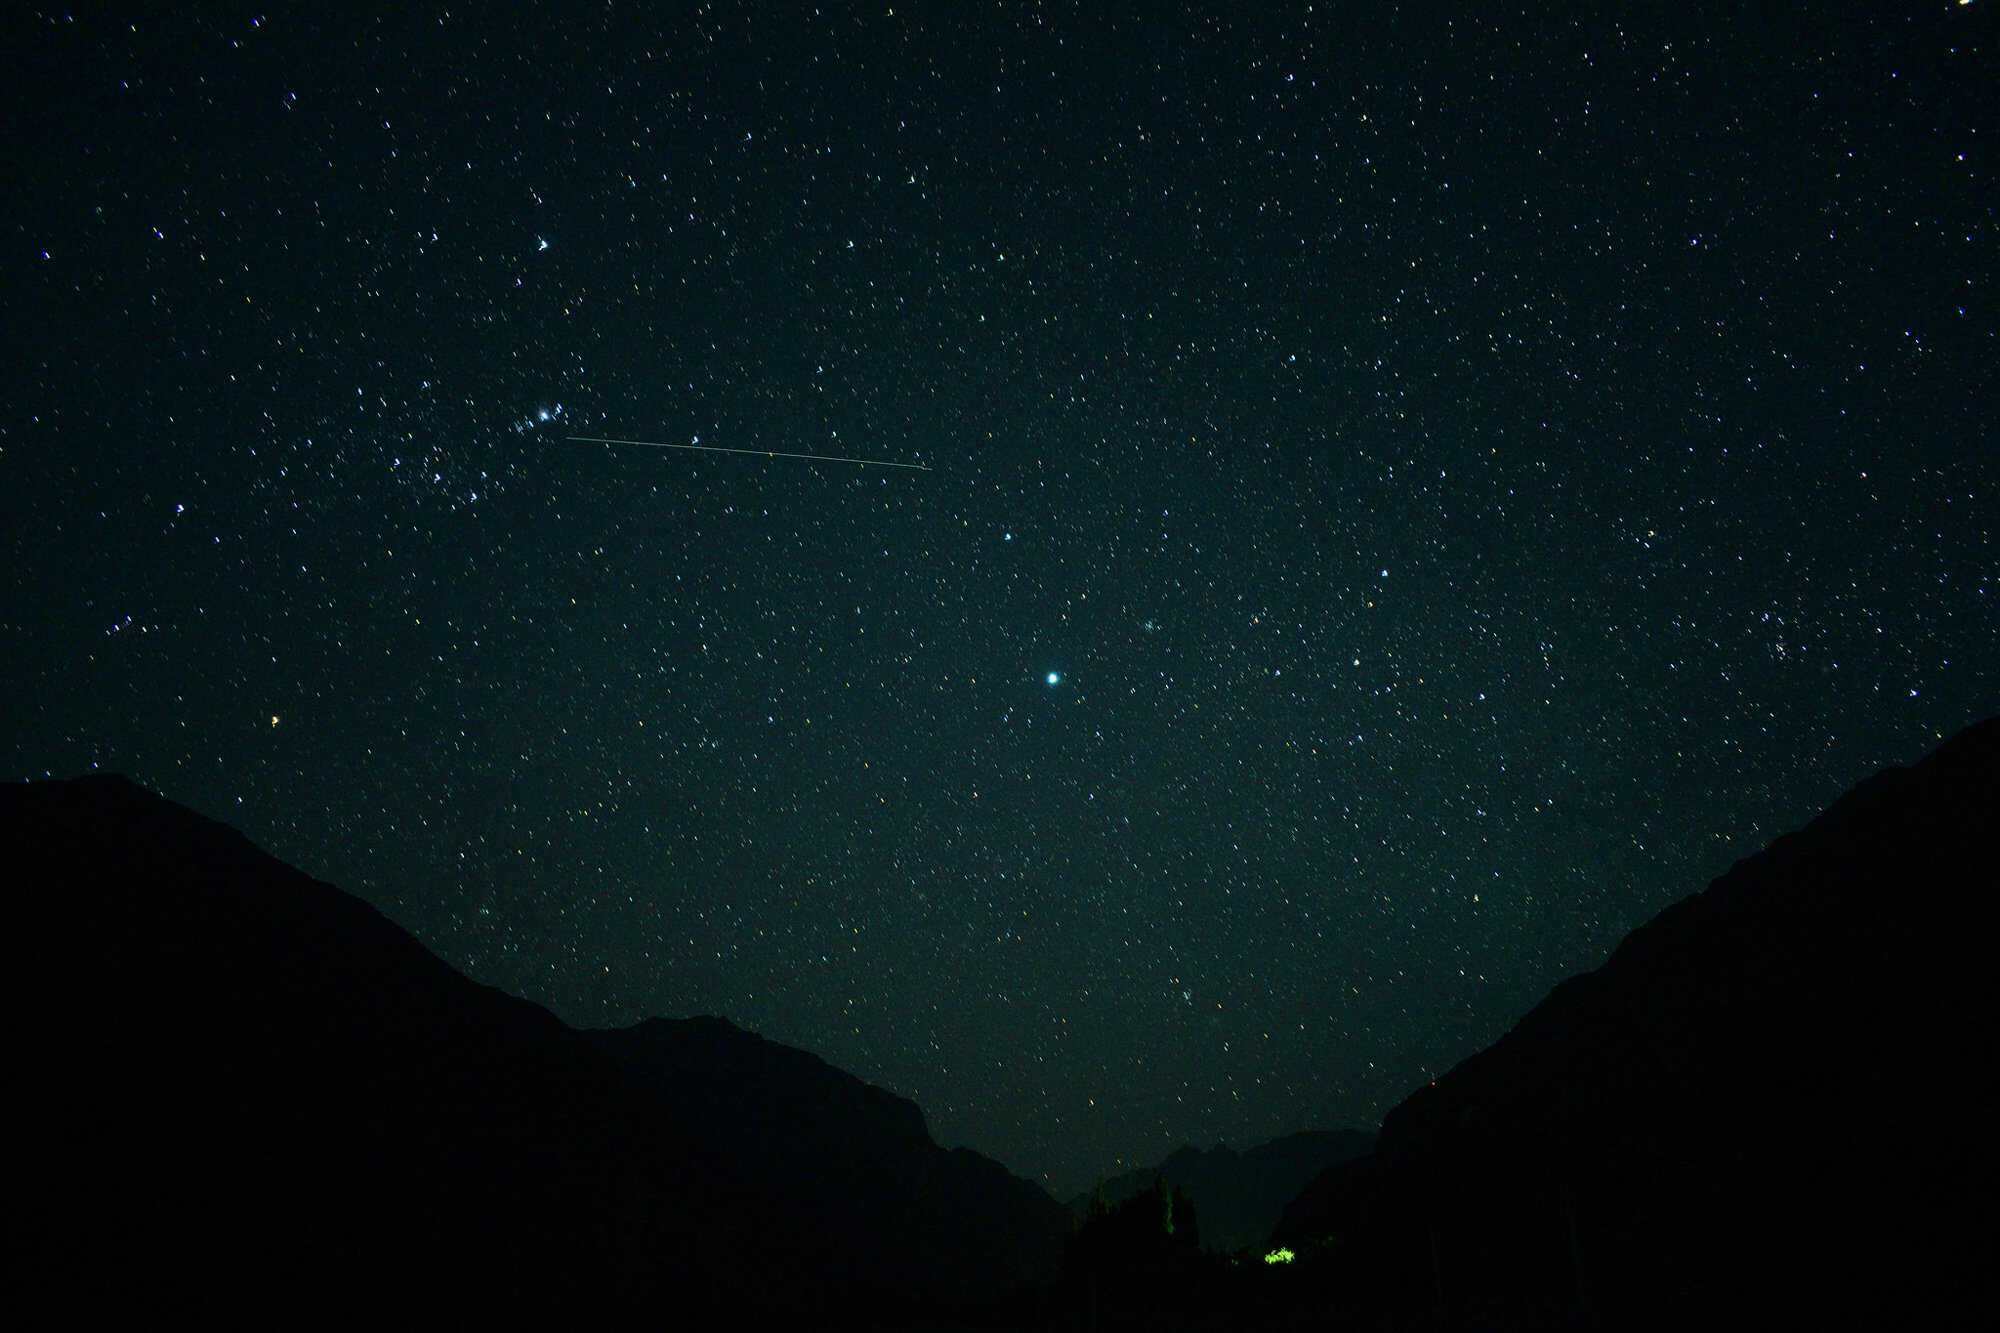 Amazon-Diary-3-Stars_4fc692ae72_k.jpg